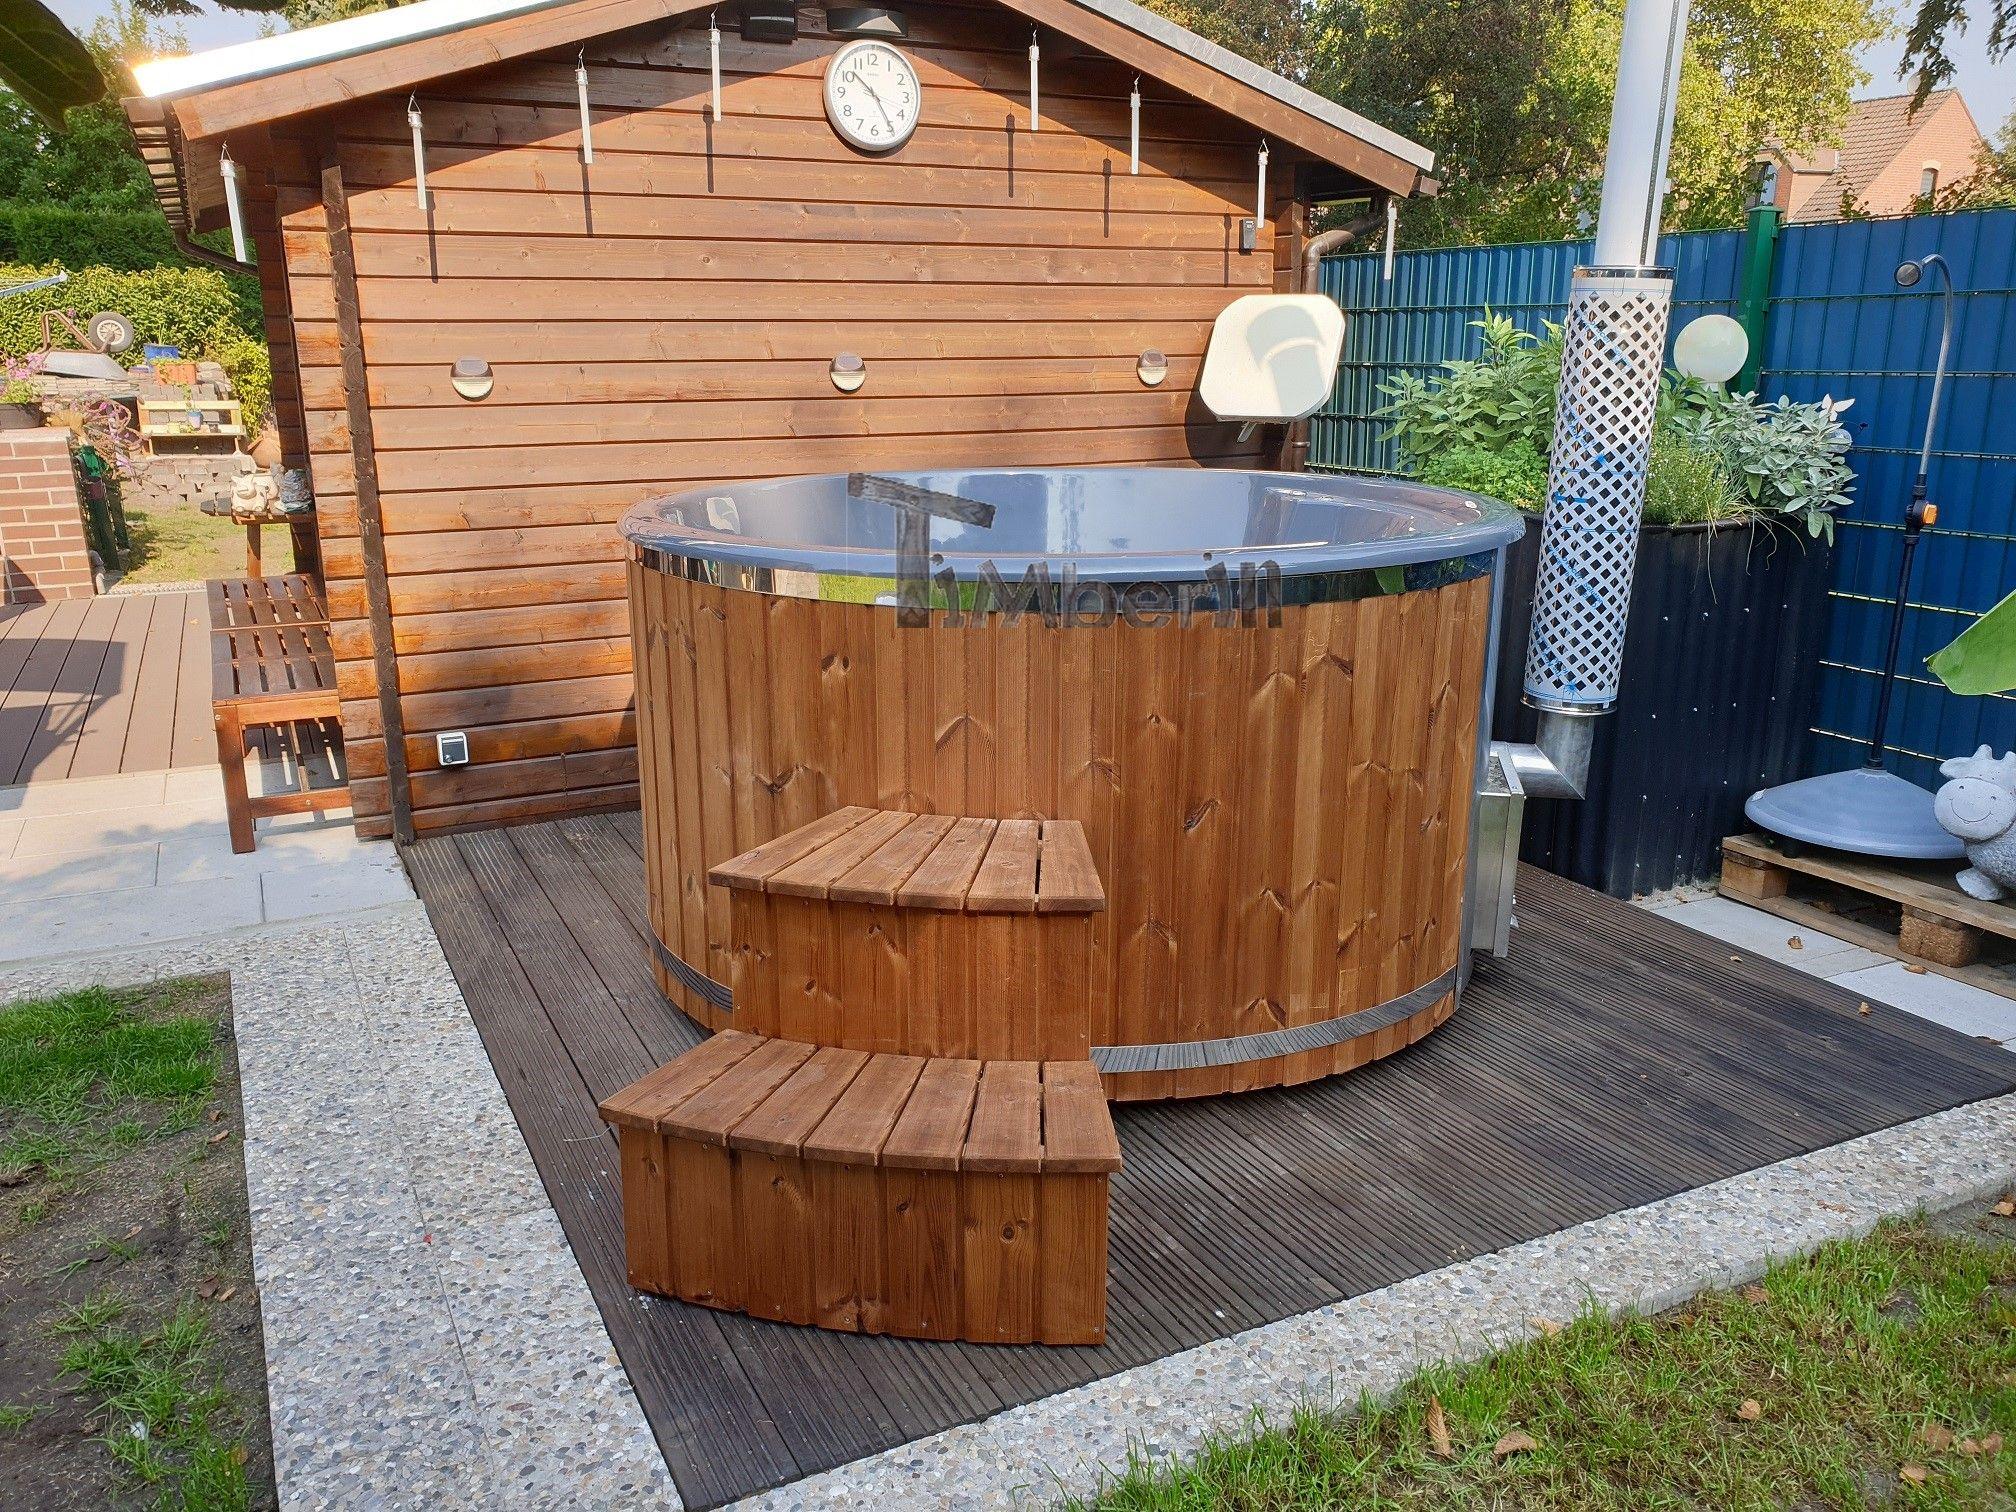 Badefass Gfk Mit Whirlpool Holz Befeuert Fur Draussen Kaufen Badefass Baden Sonnenschutz Garten